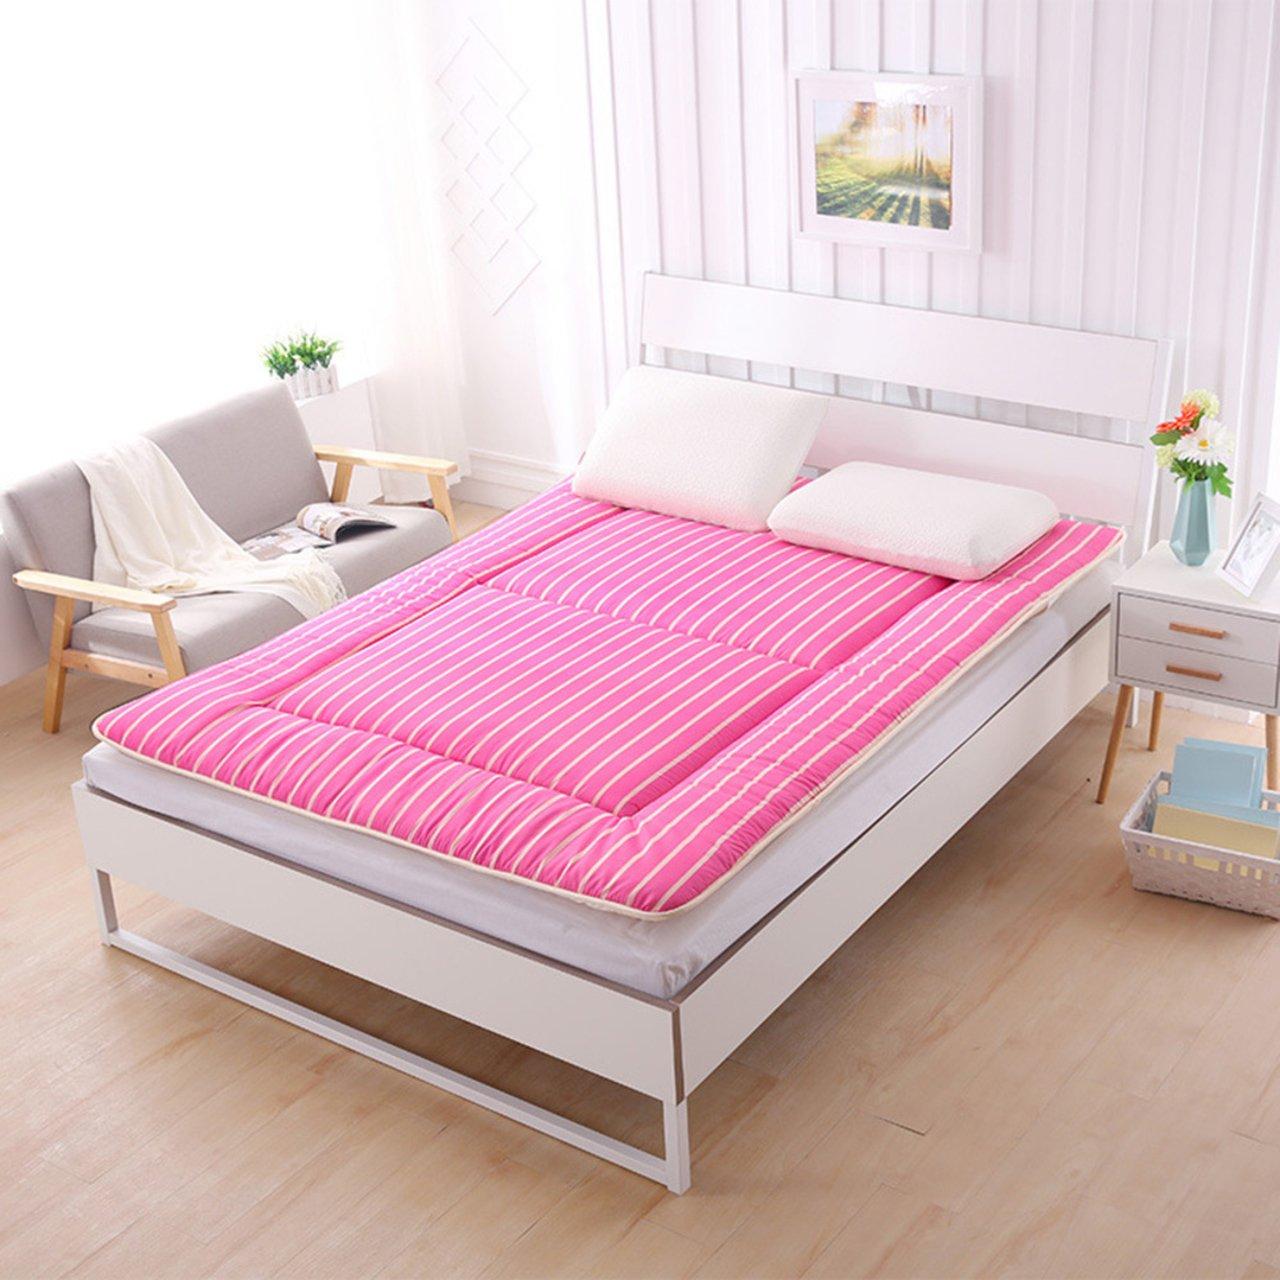 Yellow star Student dorm futon mattress topper,Tatami floor mat double mattress quilted foldable cushion mats non-slip foldable cushion mats-pink 90x195cm(35x77inch)